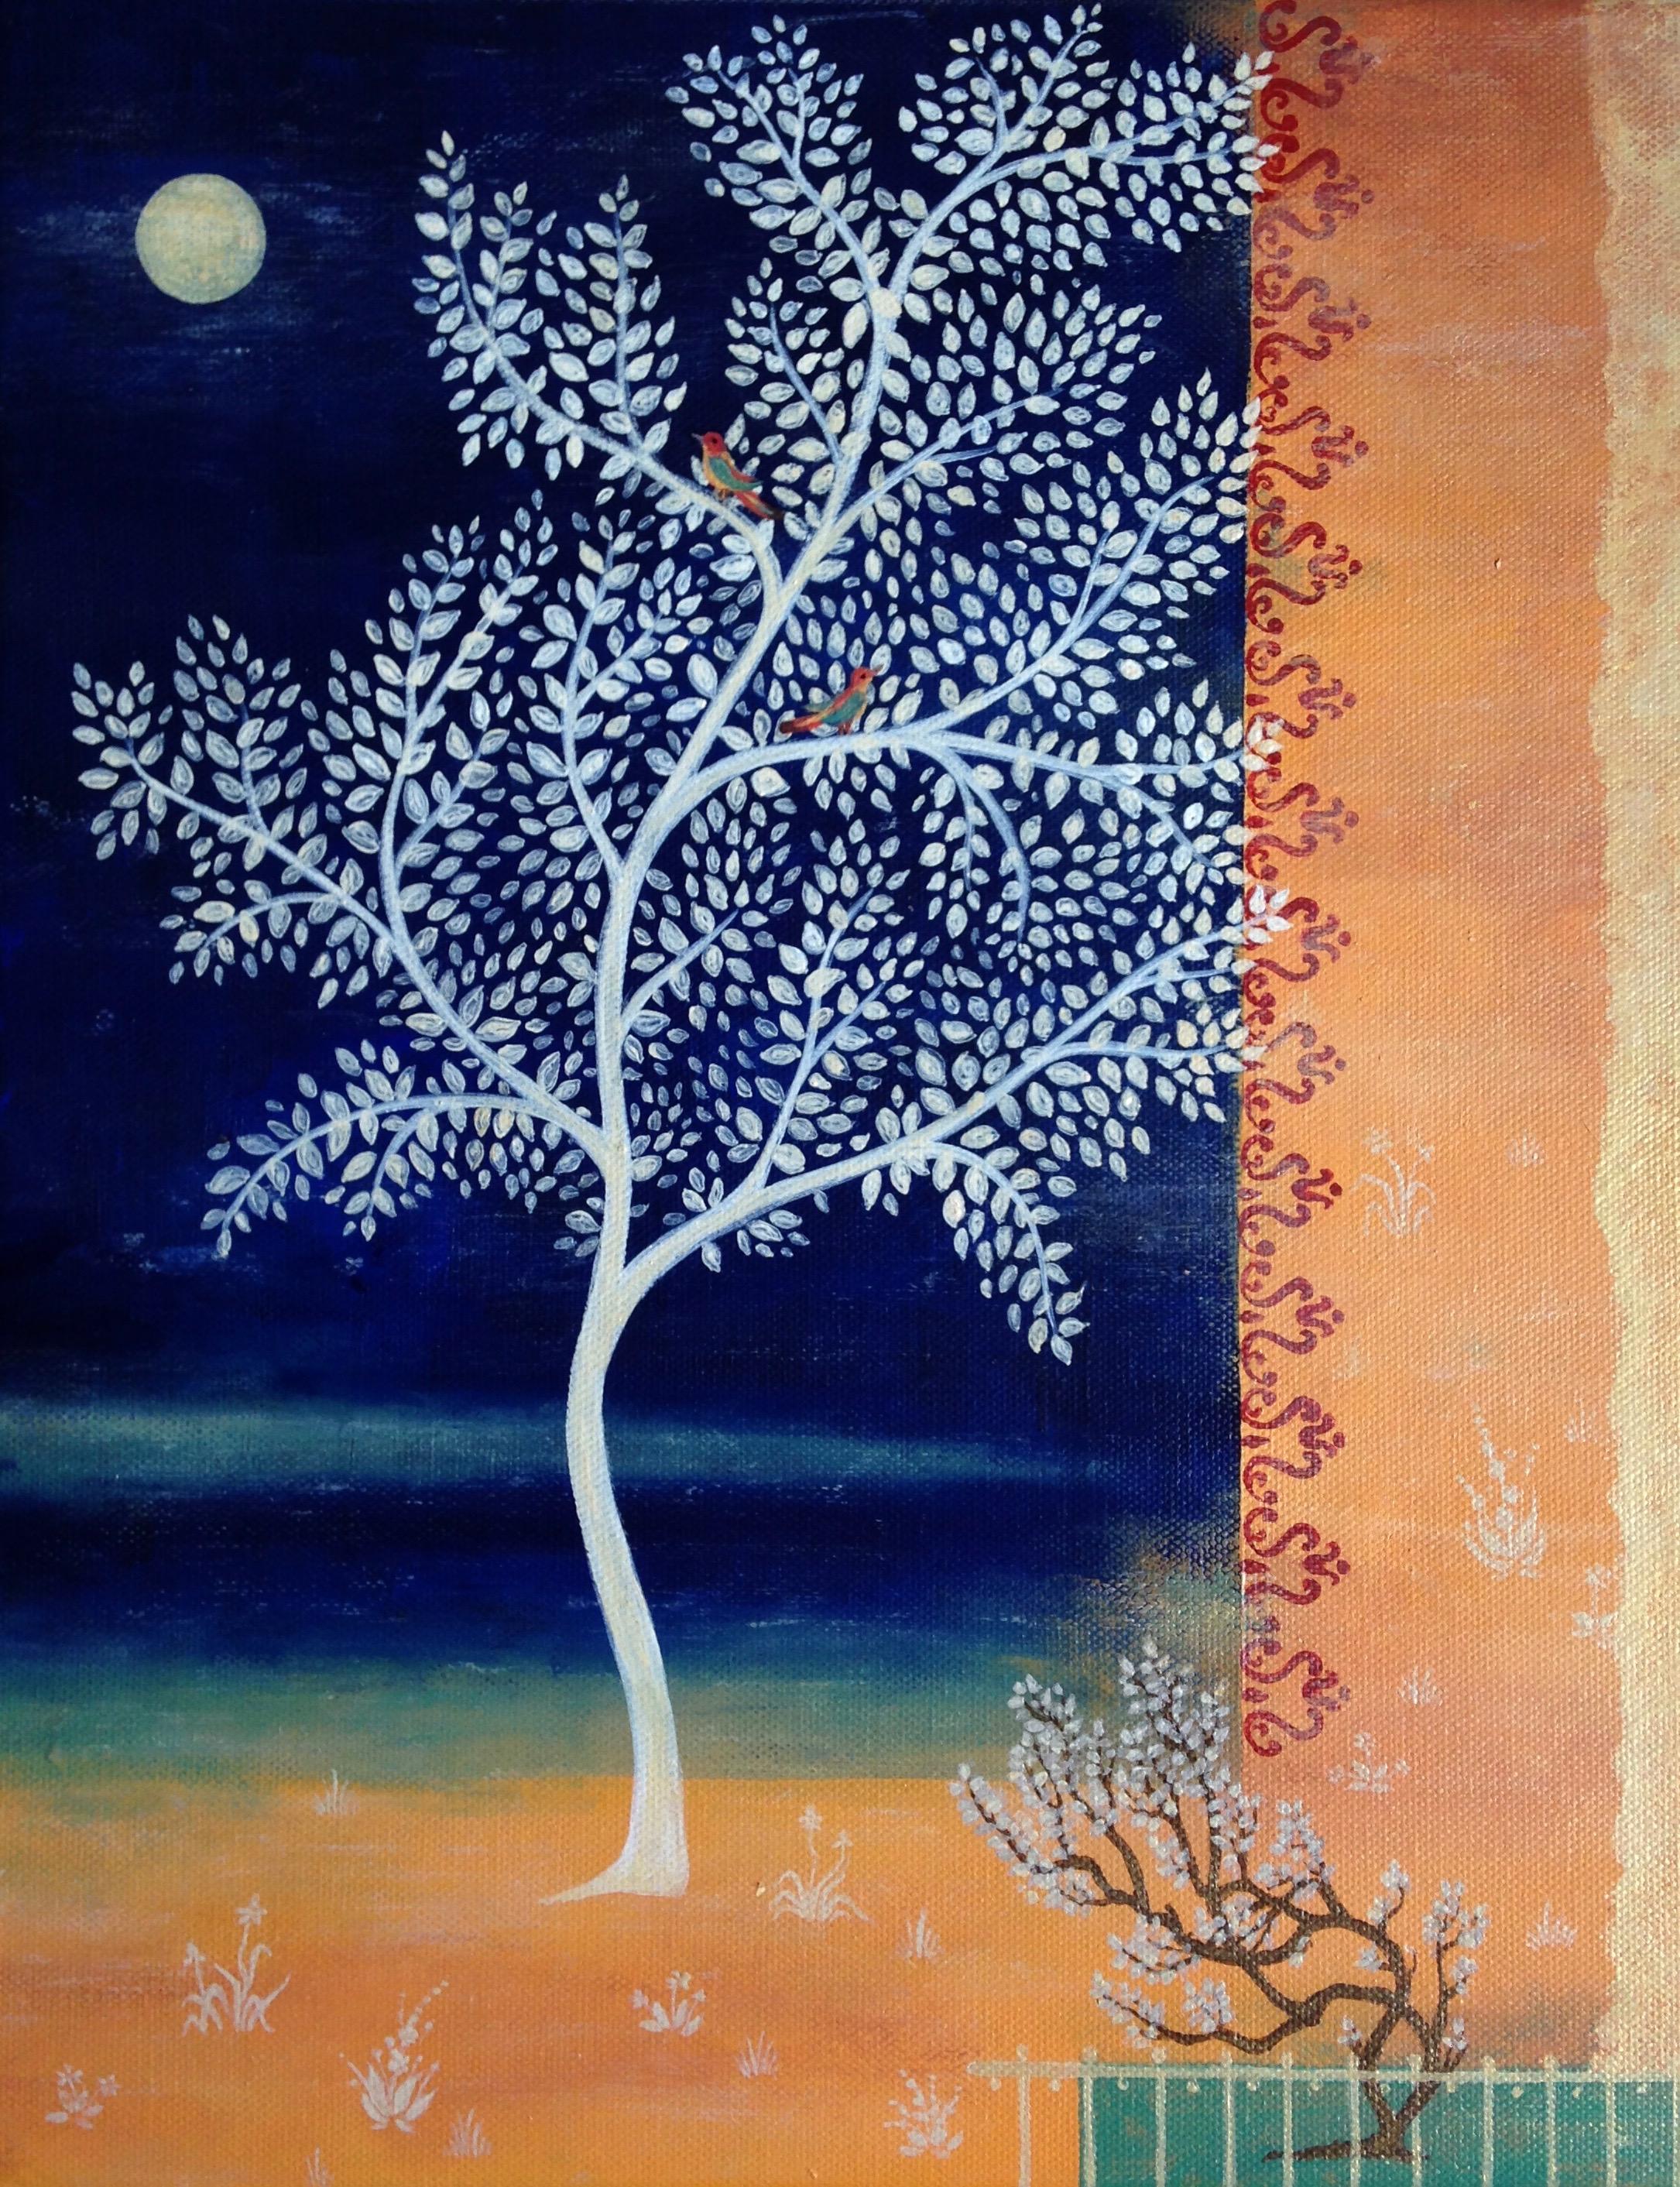 twilight in the saffron garden, 11''x14'', acrylic on canvas, 2018.